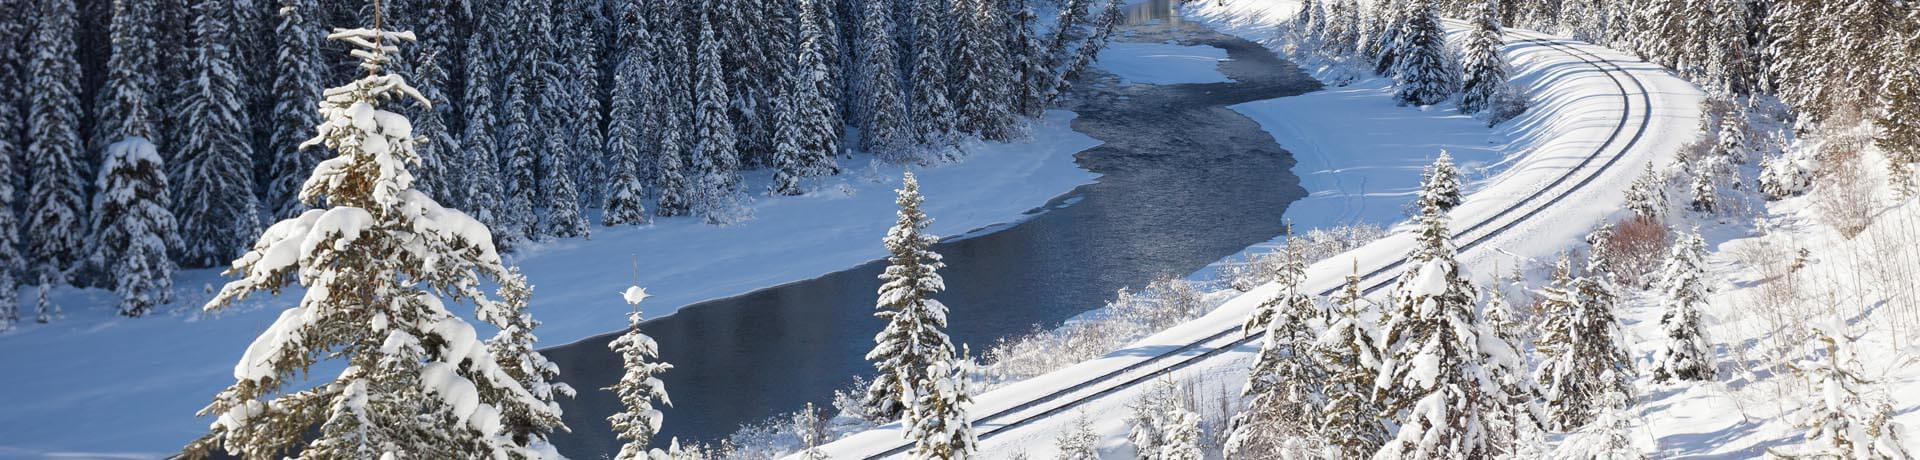 Railway in the Canadian Rockies